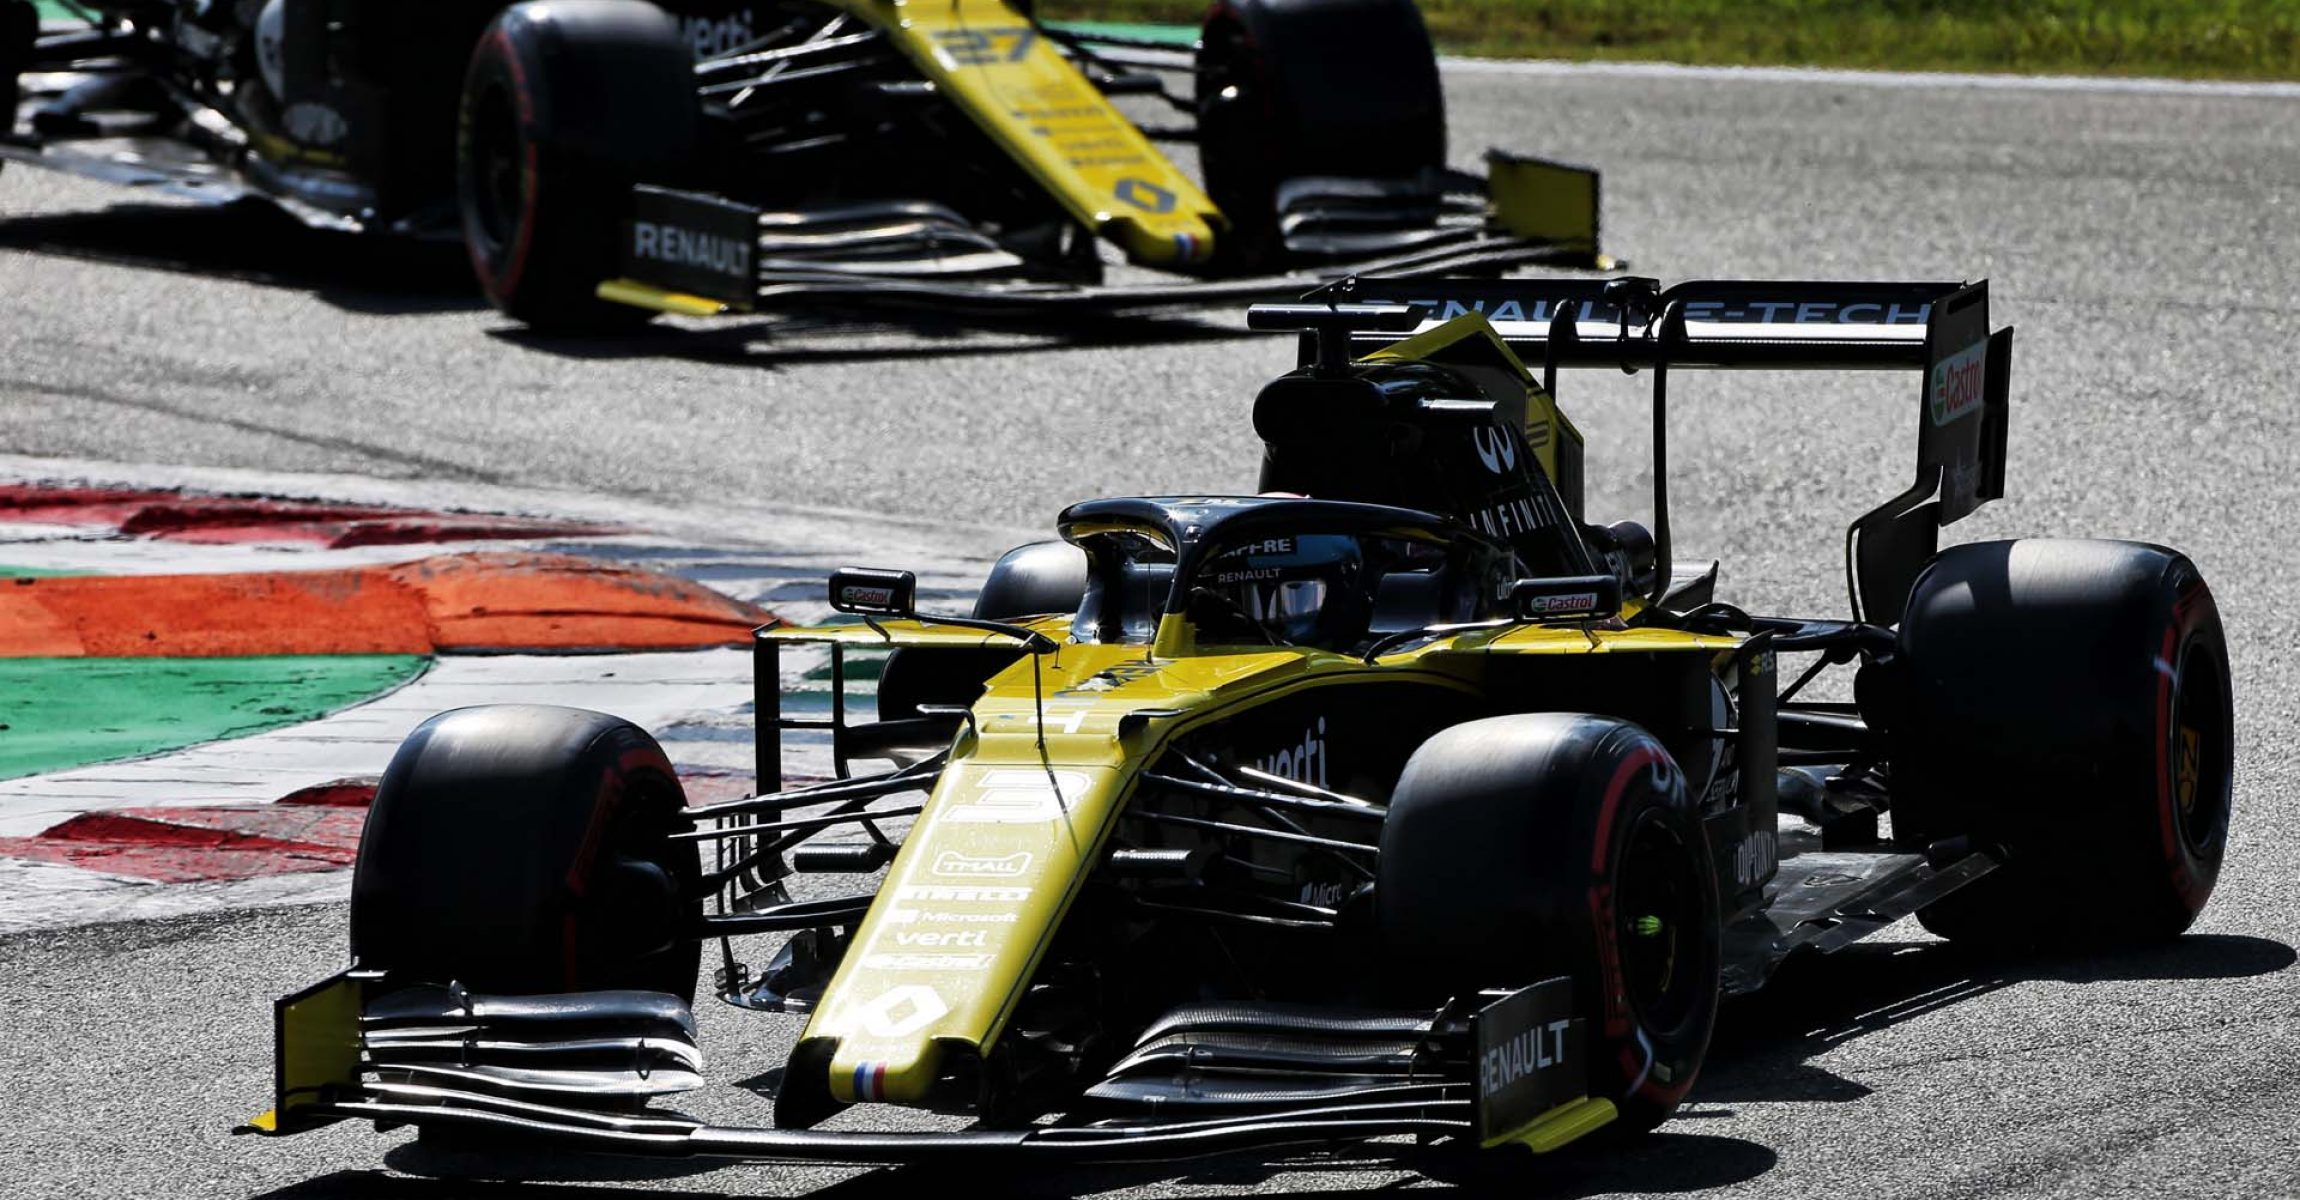 Daniel Ricciardo (AUS) Renault F1 Team RS19. Italian Grand Prix, Saturday 7th September 2019. Monza Italy.